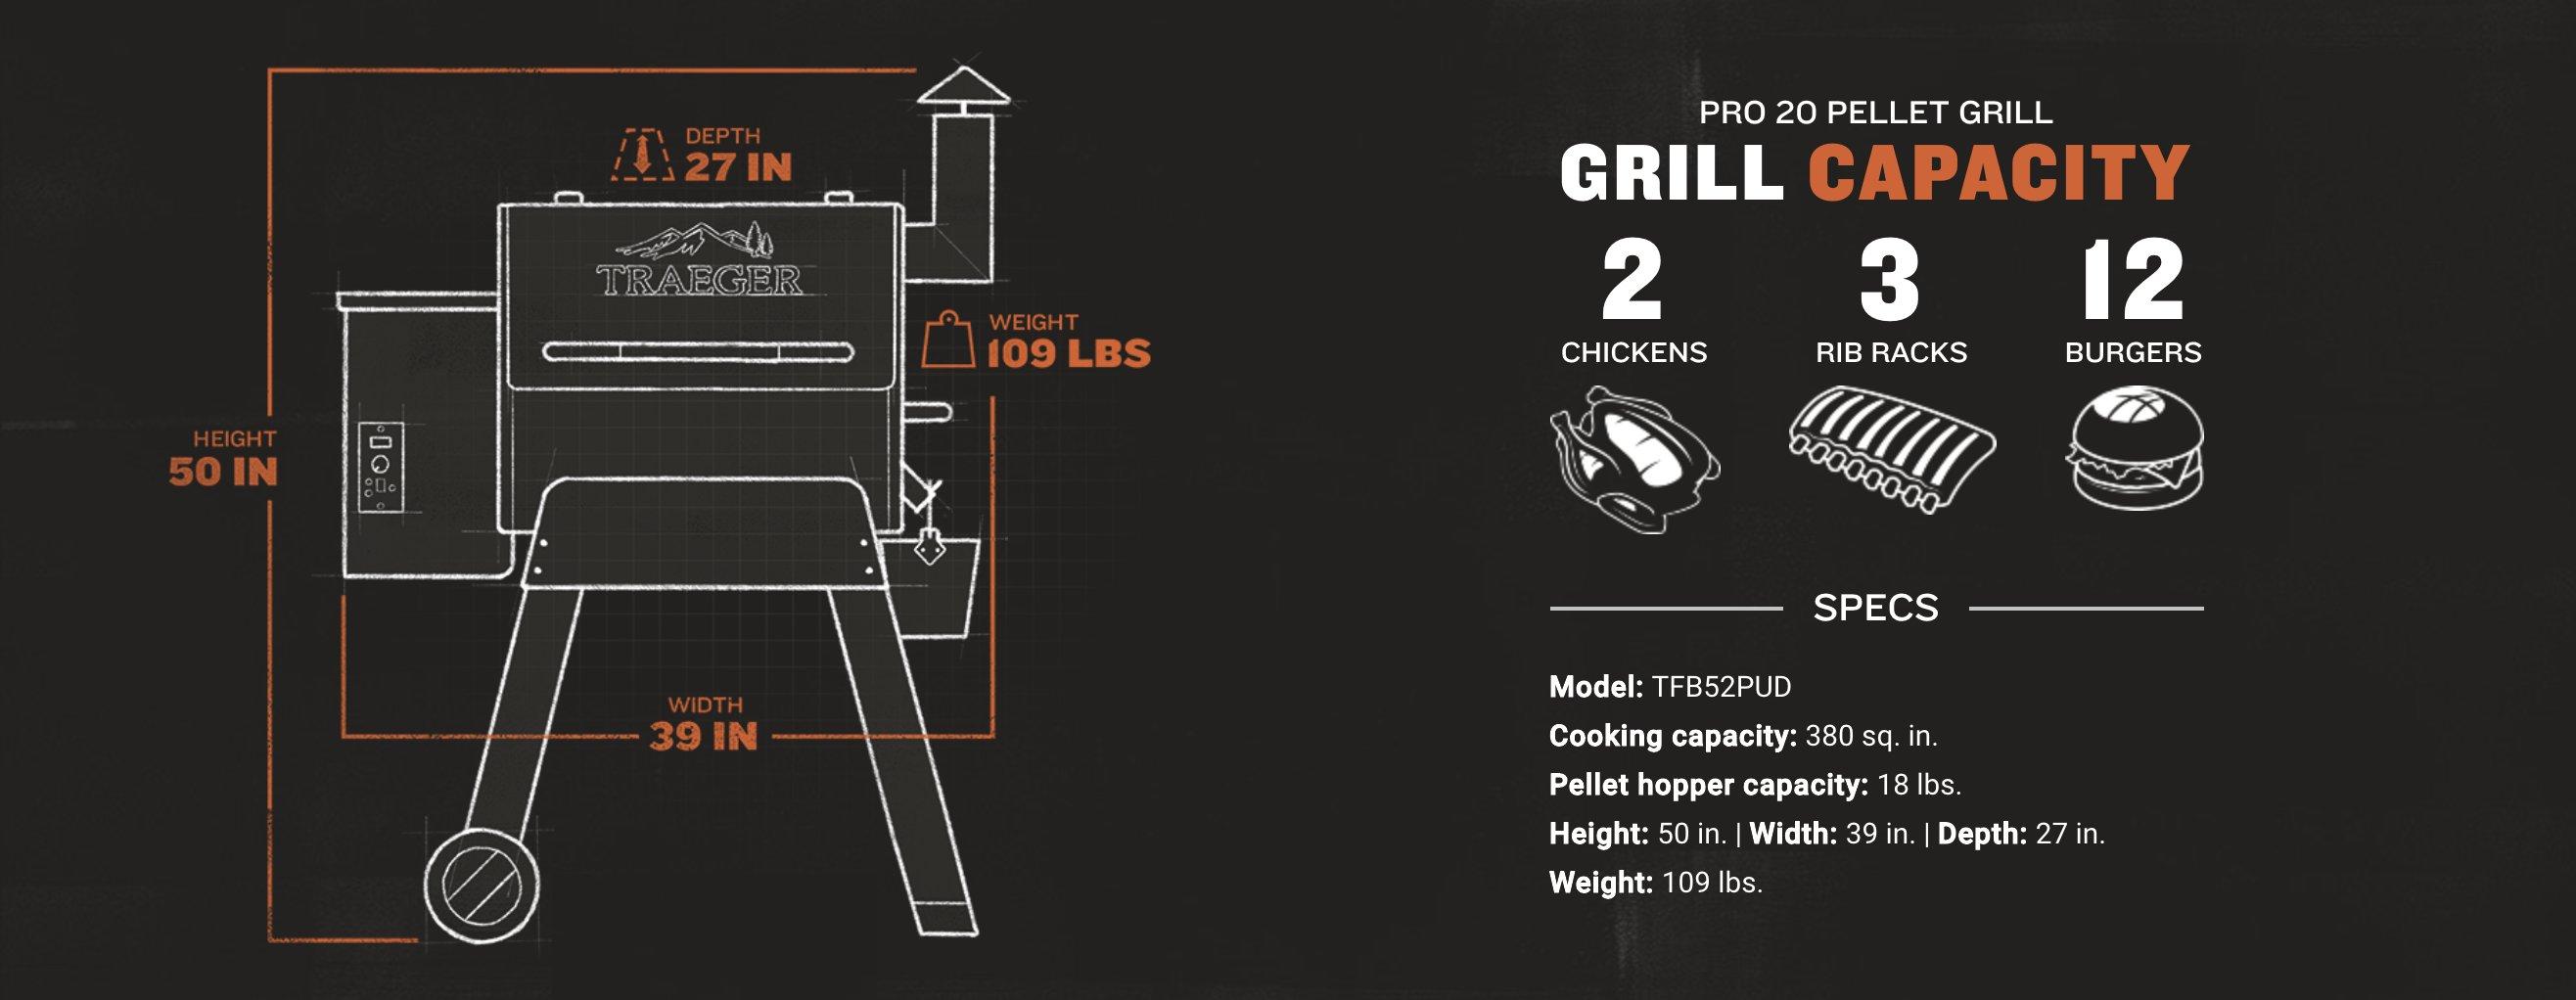 Traeger Grill Capacity